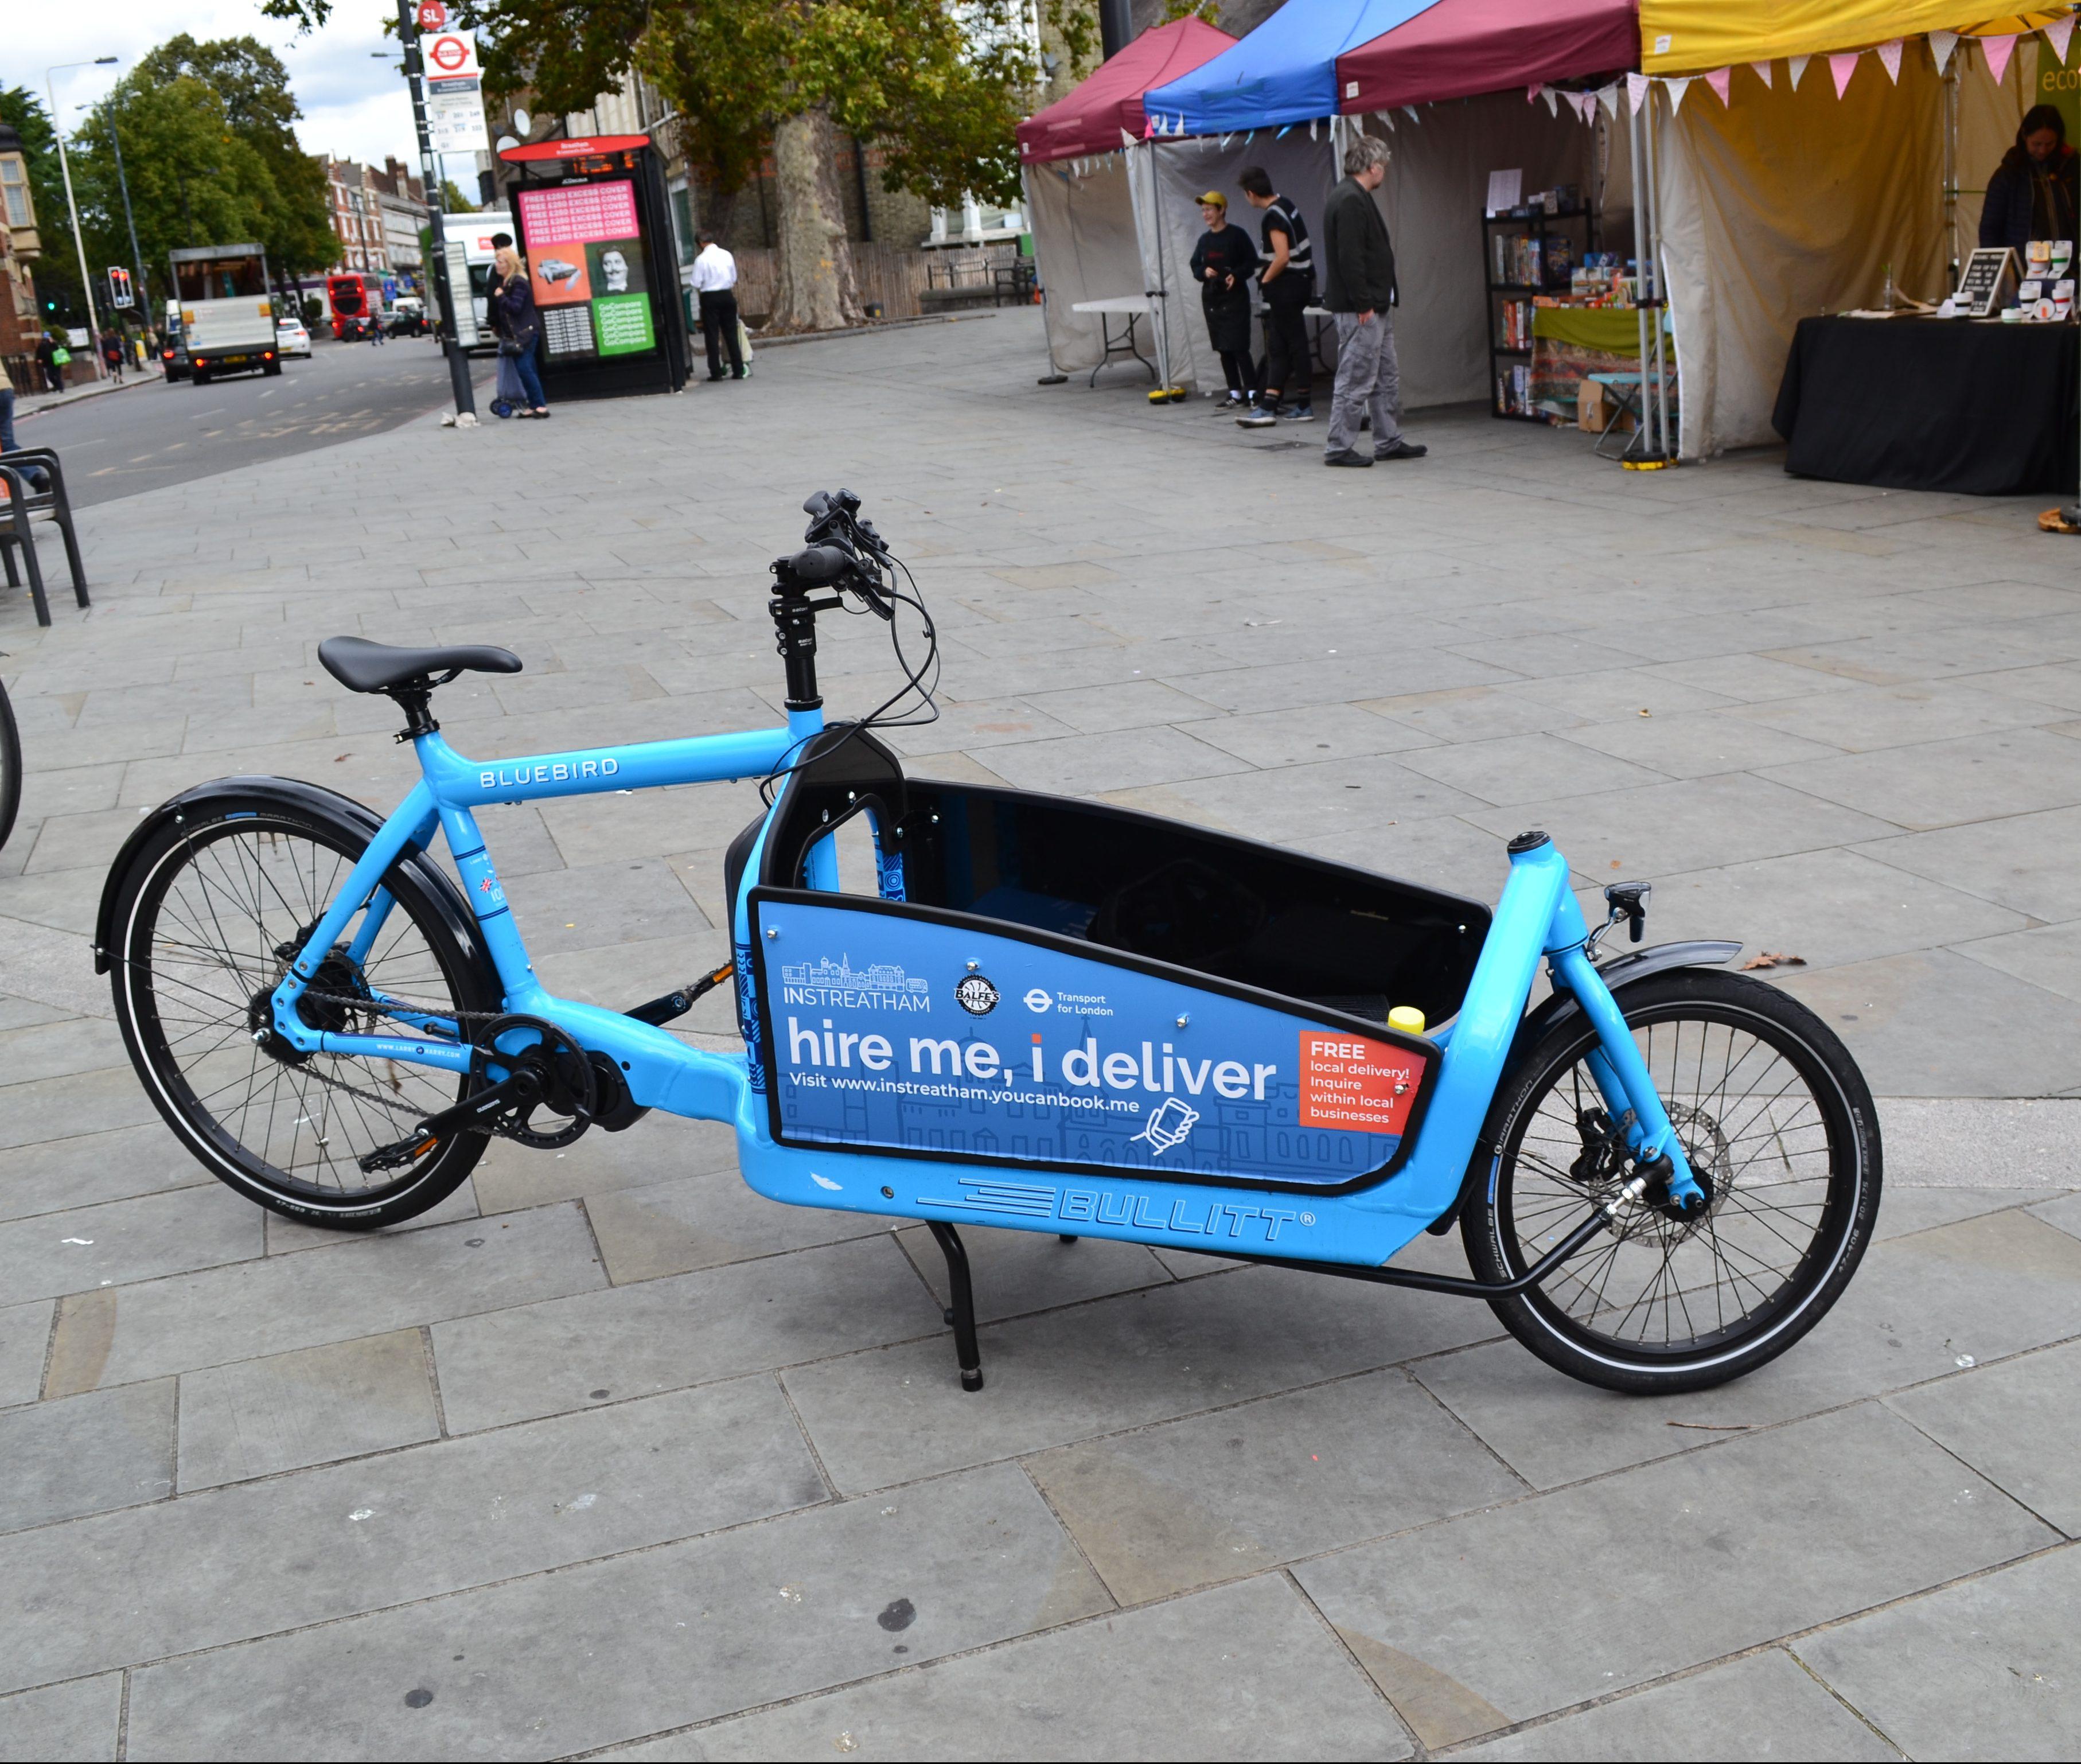 Cargo bike at Streatham market